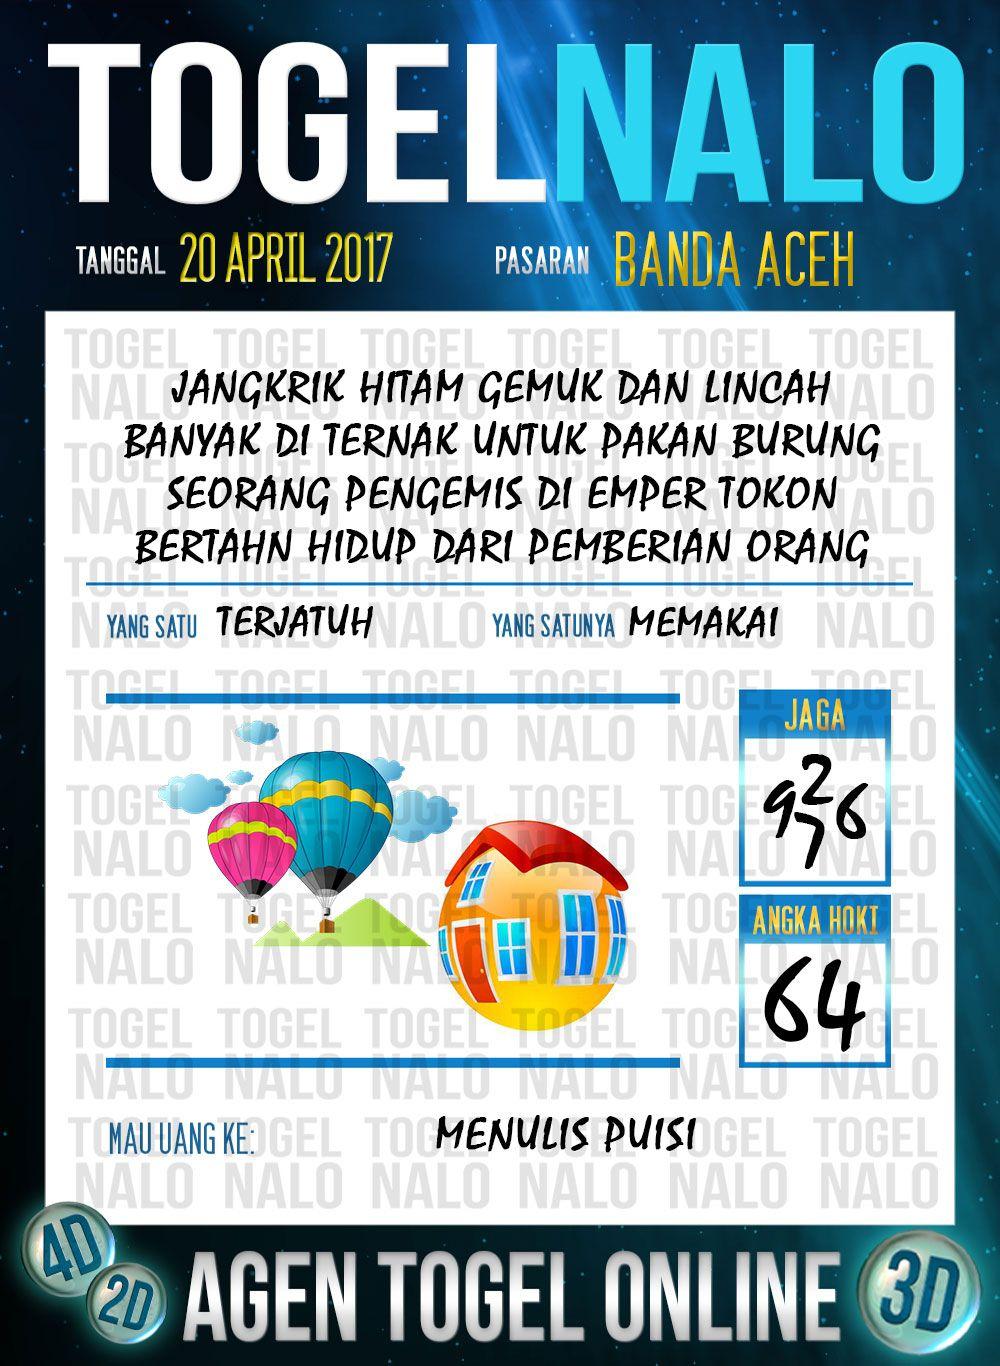 Angka Ikut 3d Togel Wap Online Togelnalo Banda Aceh 20 April 2017 Banda Aceh Orang Tanggal